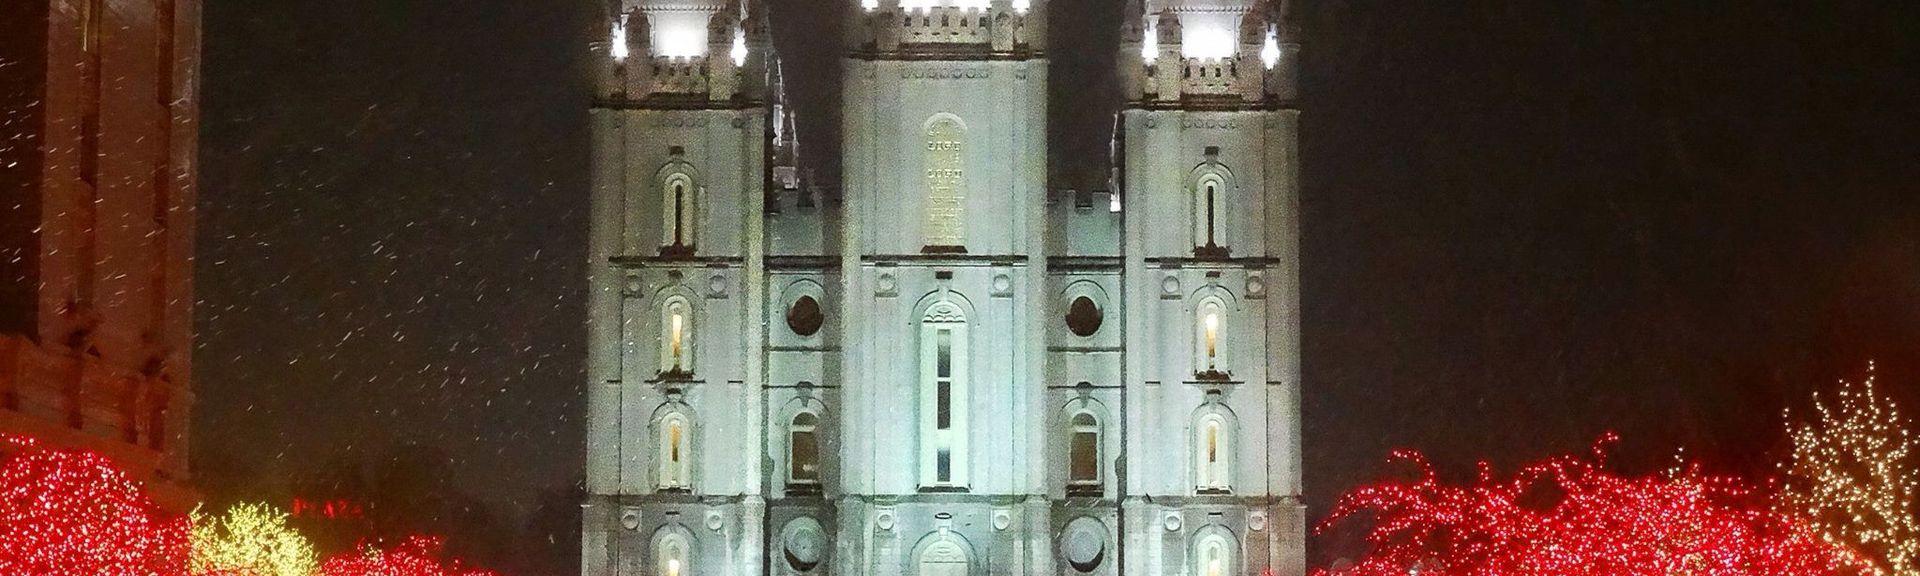 Temple Square, Salt Lake City, Utah, United States of America